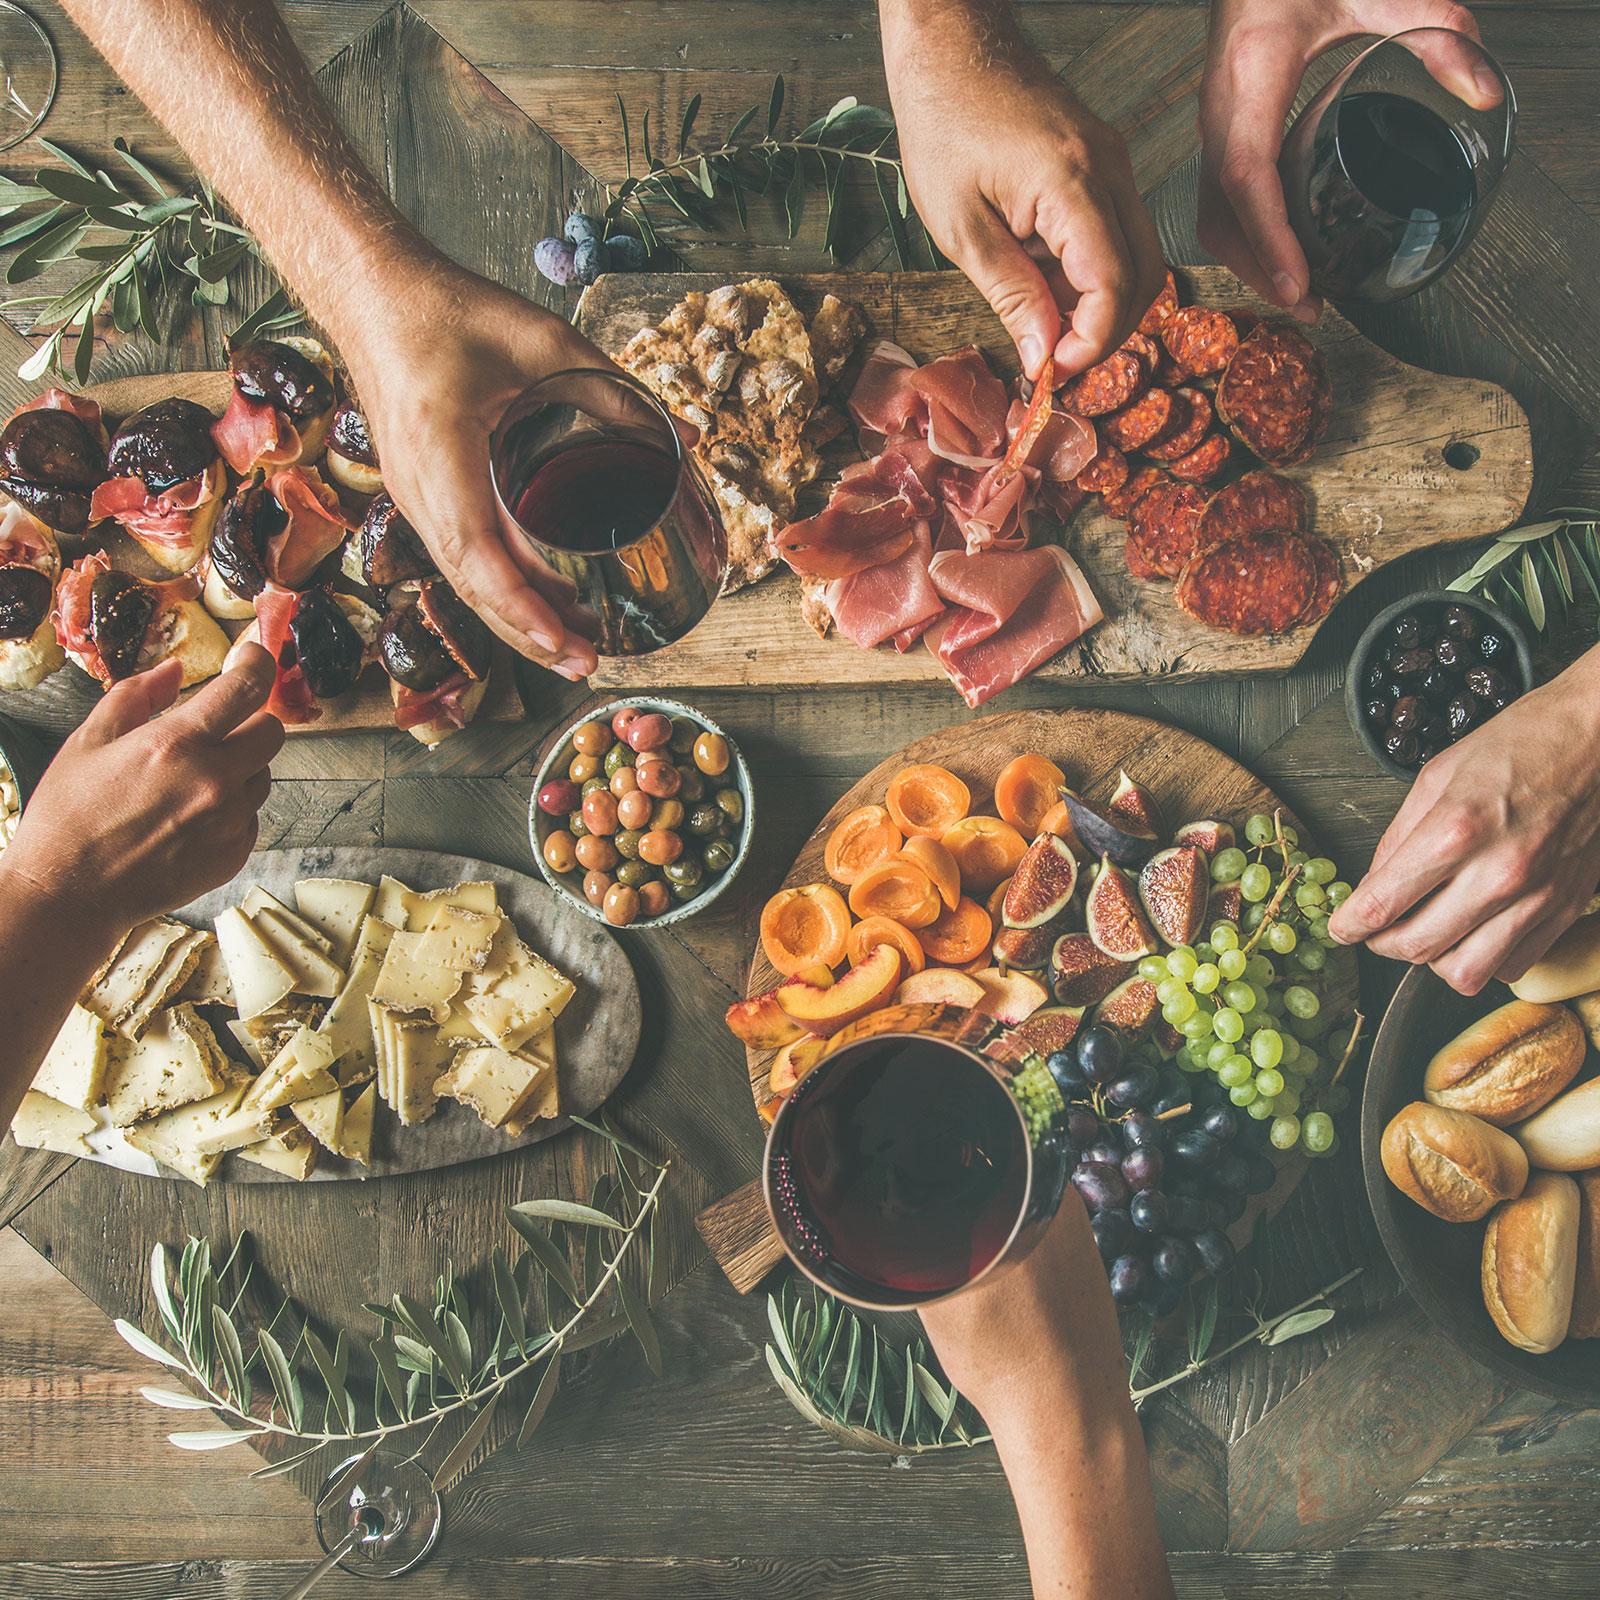 glad og sund hjemmegruppe spiser